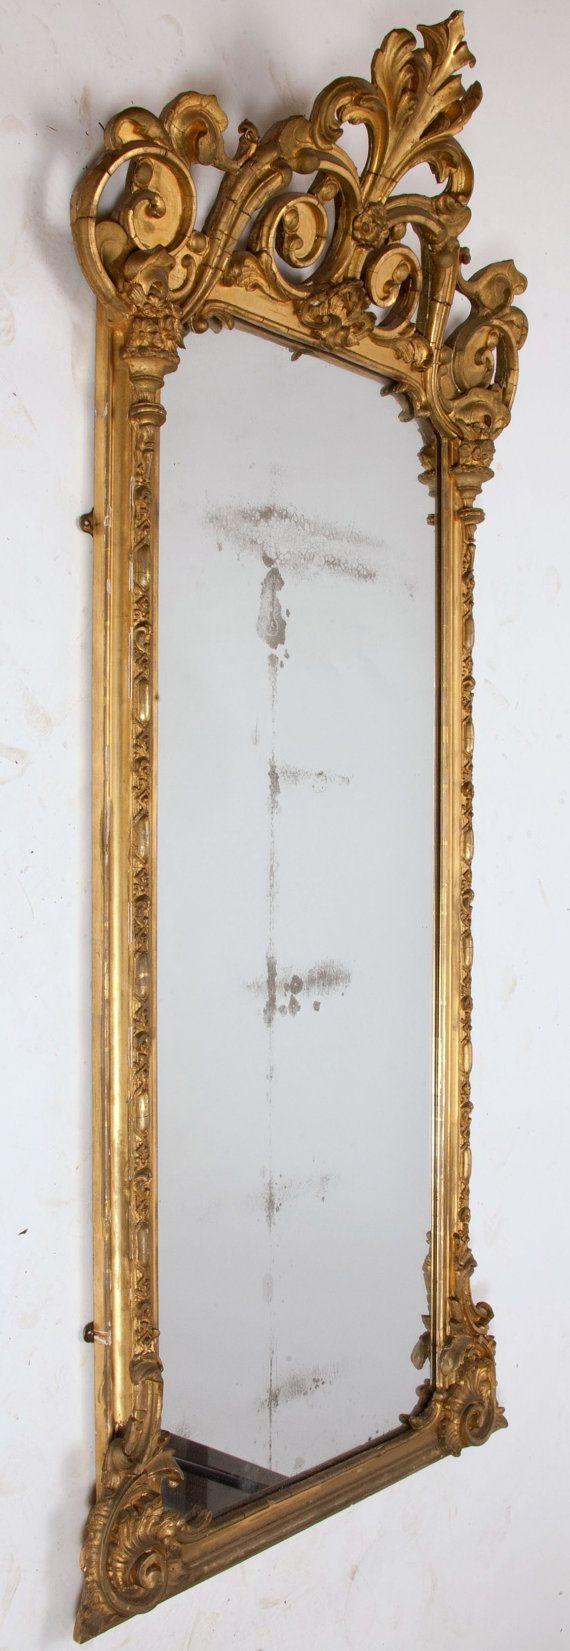 Circa 1870 S Victorian Pier Mirror